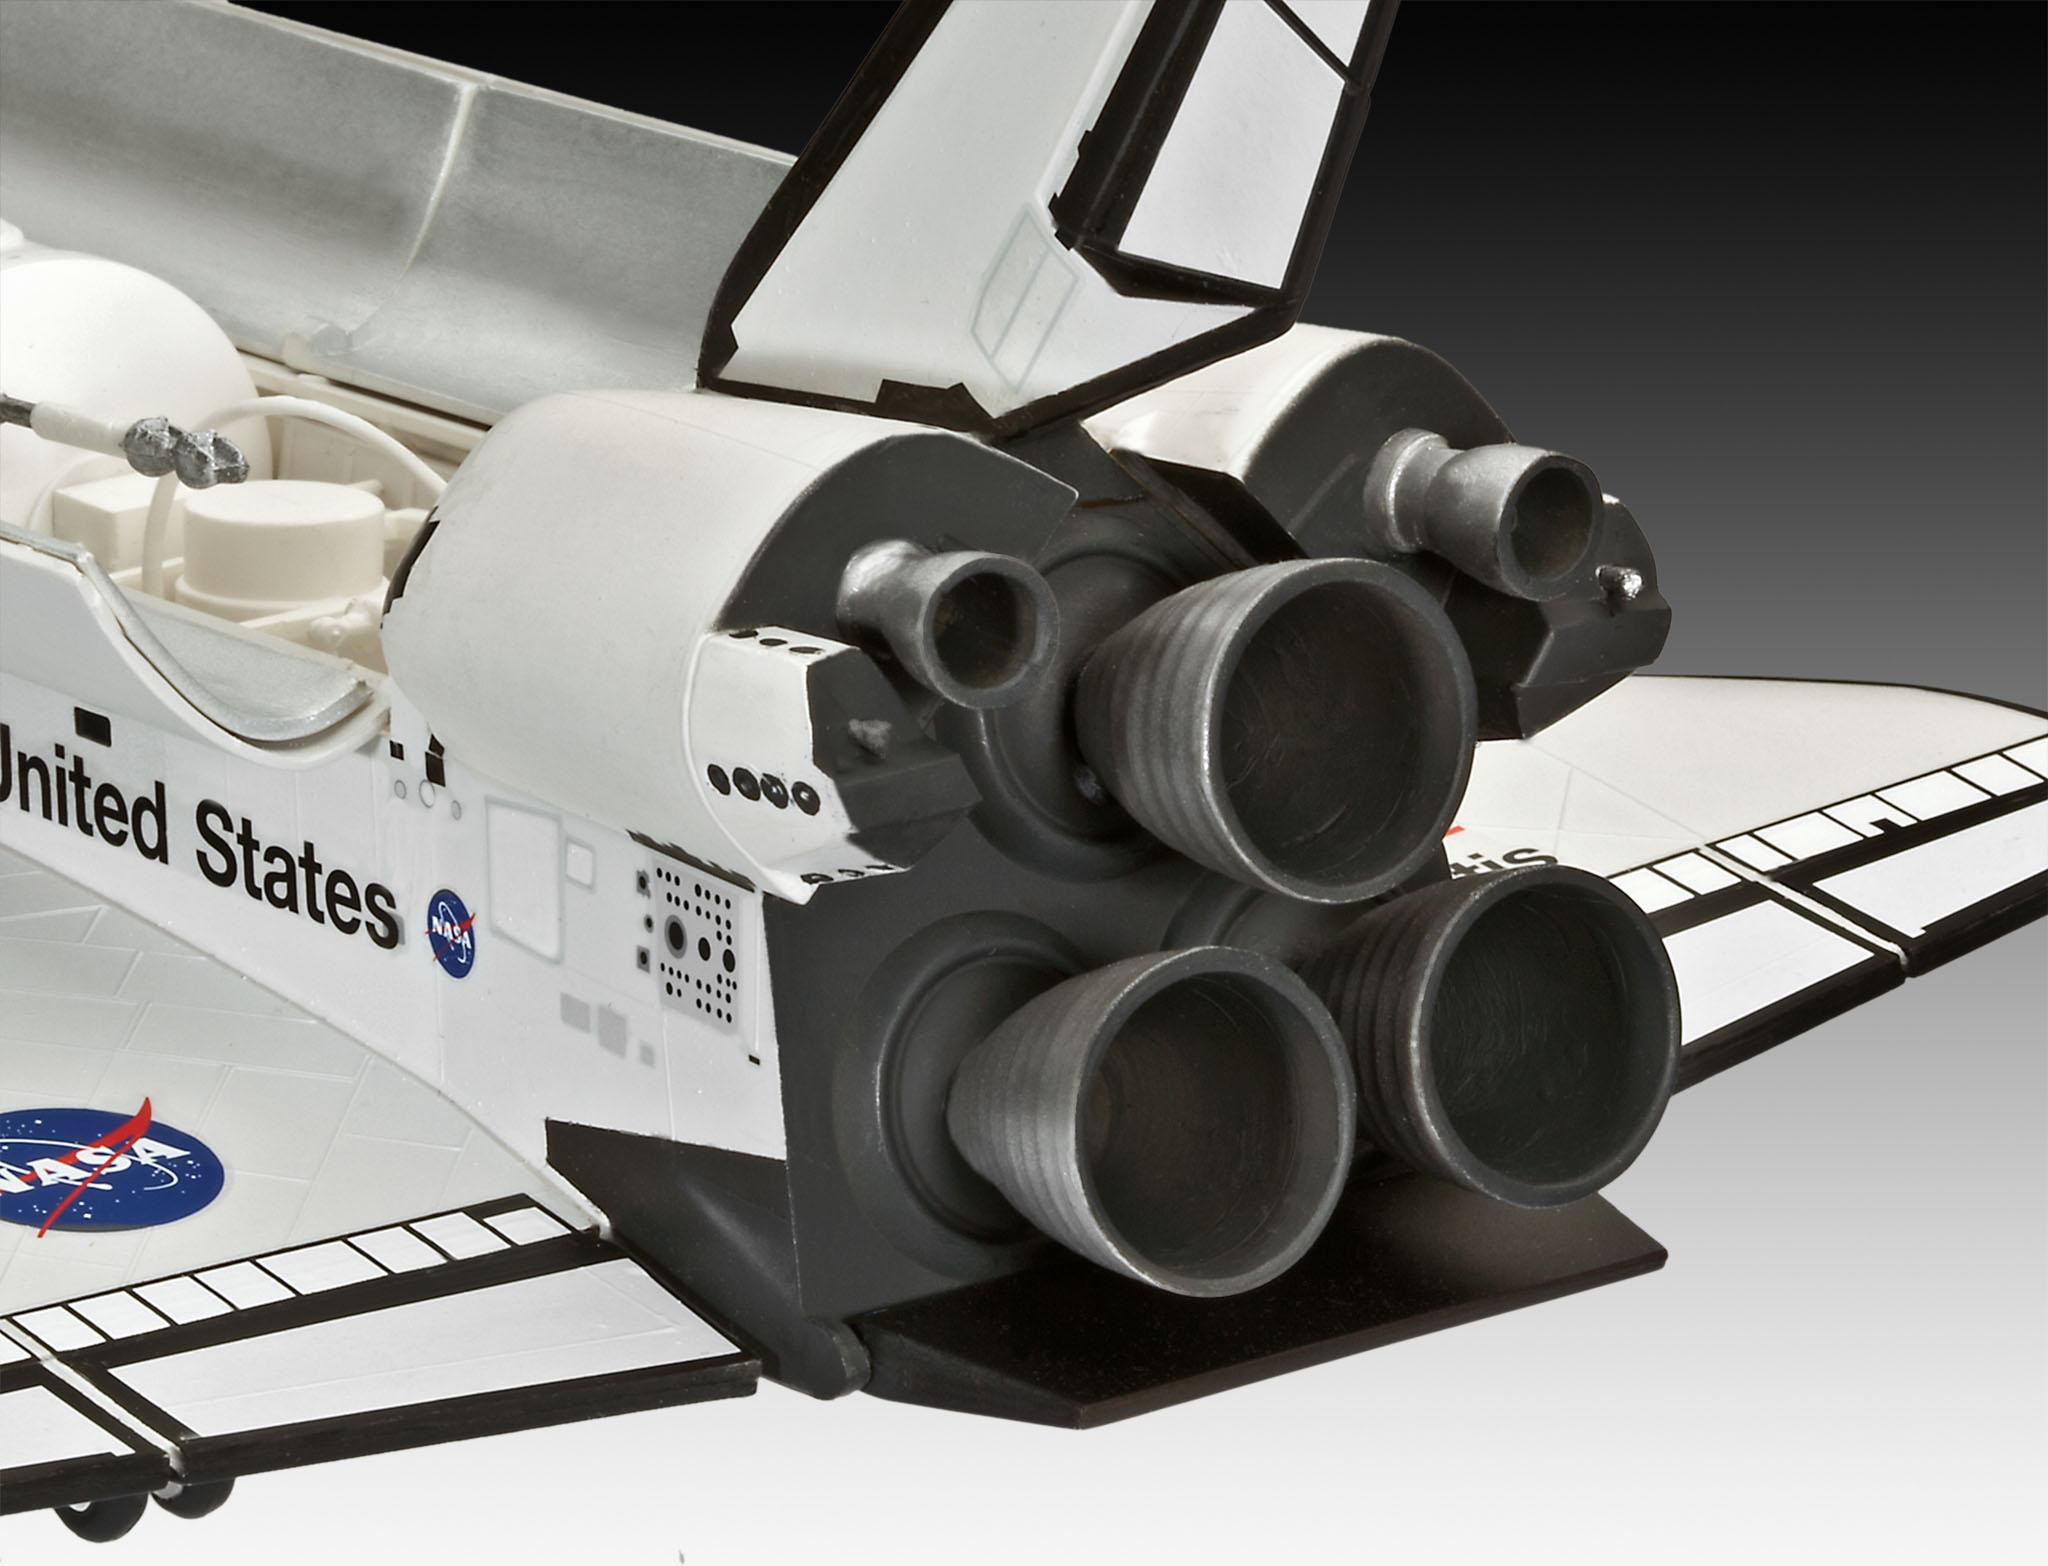 space shuttle atlantis toy - photo #37